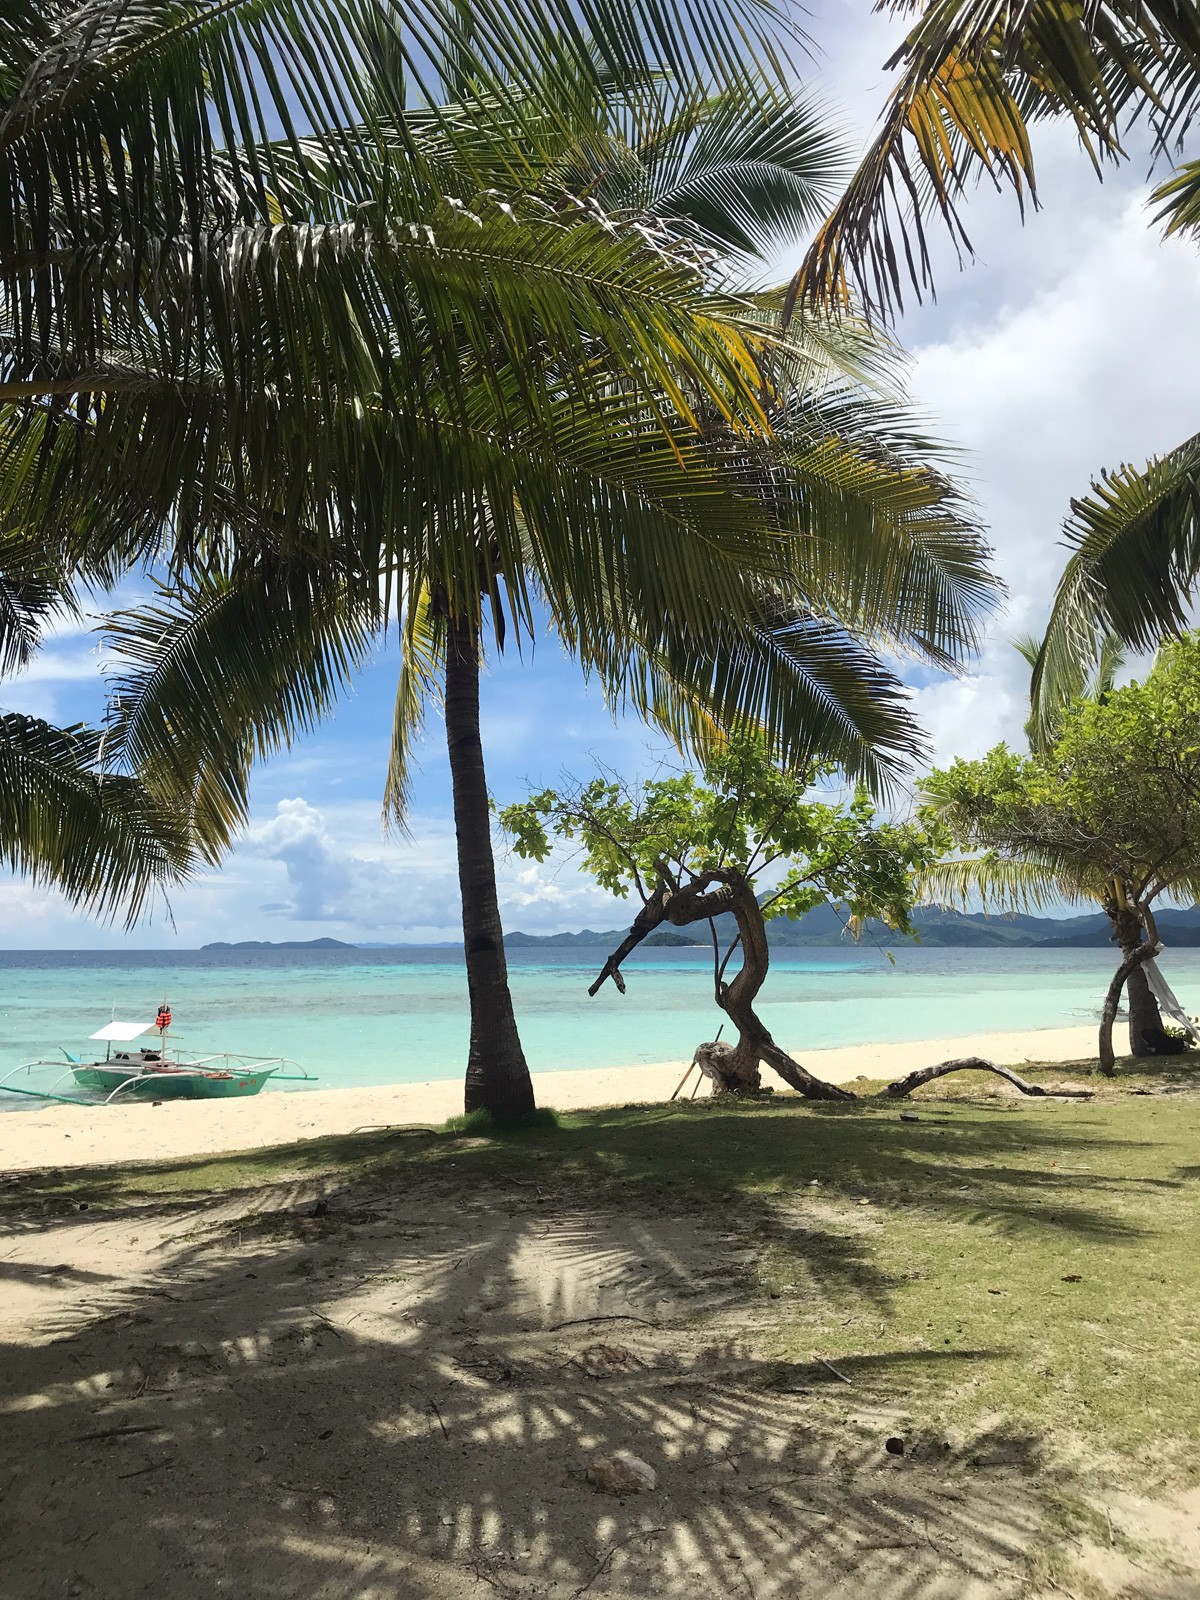 Malcapuya island, Philippines